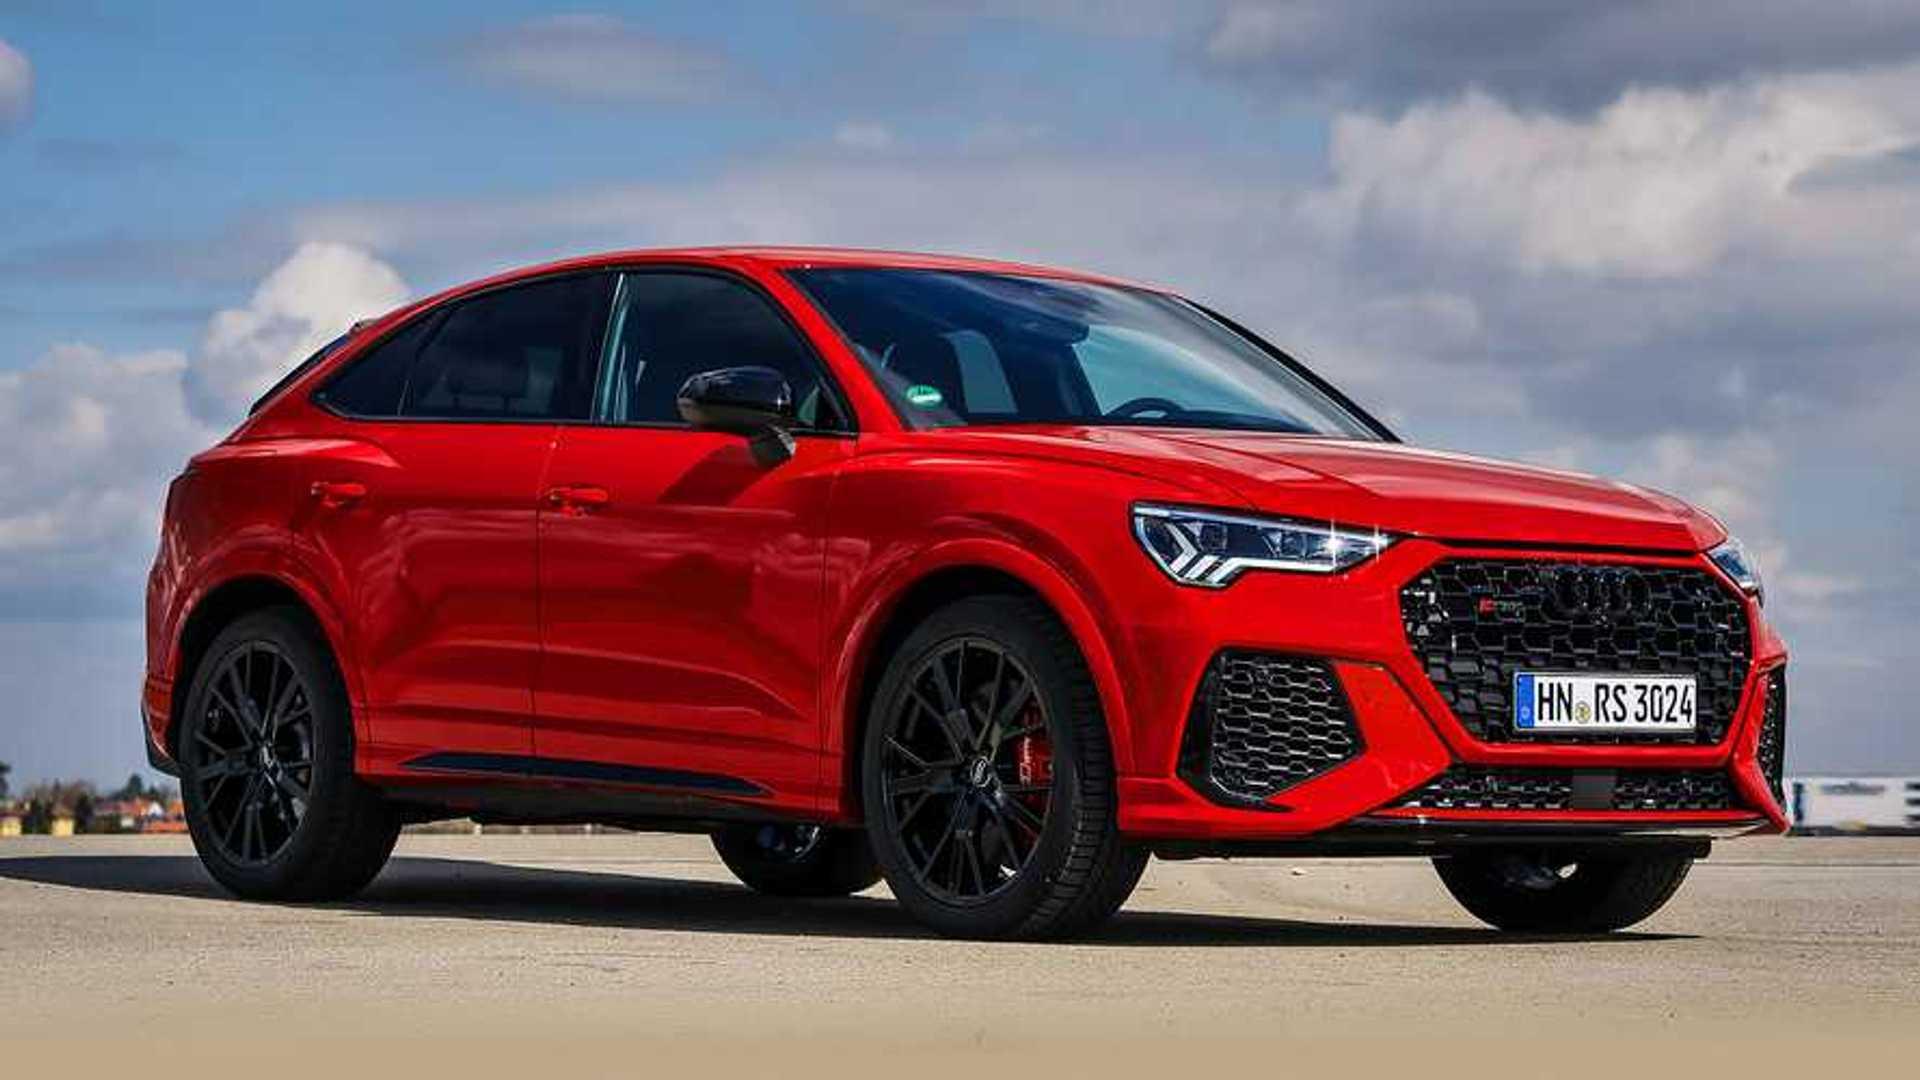 Audi Rs Q3 Sportback 2020 Es Suficiente Ser Muy Rapido